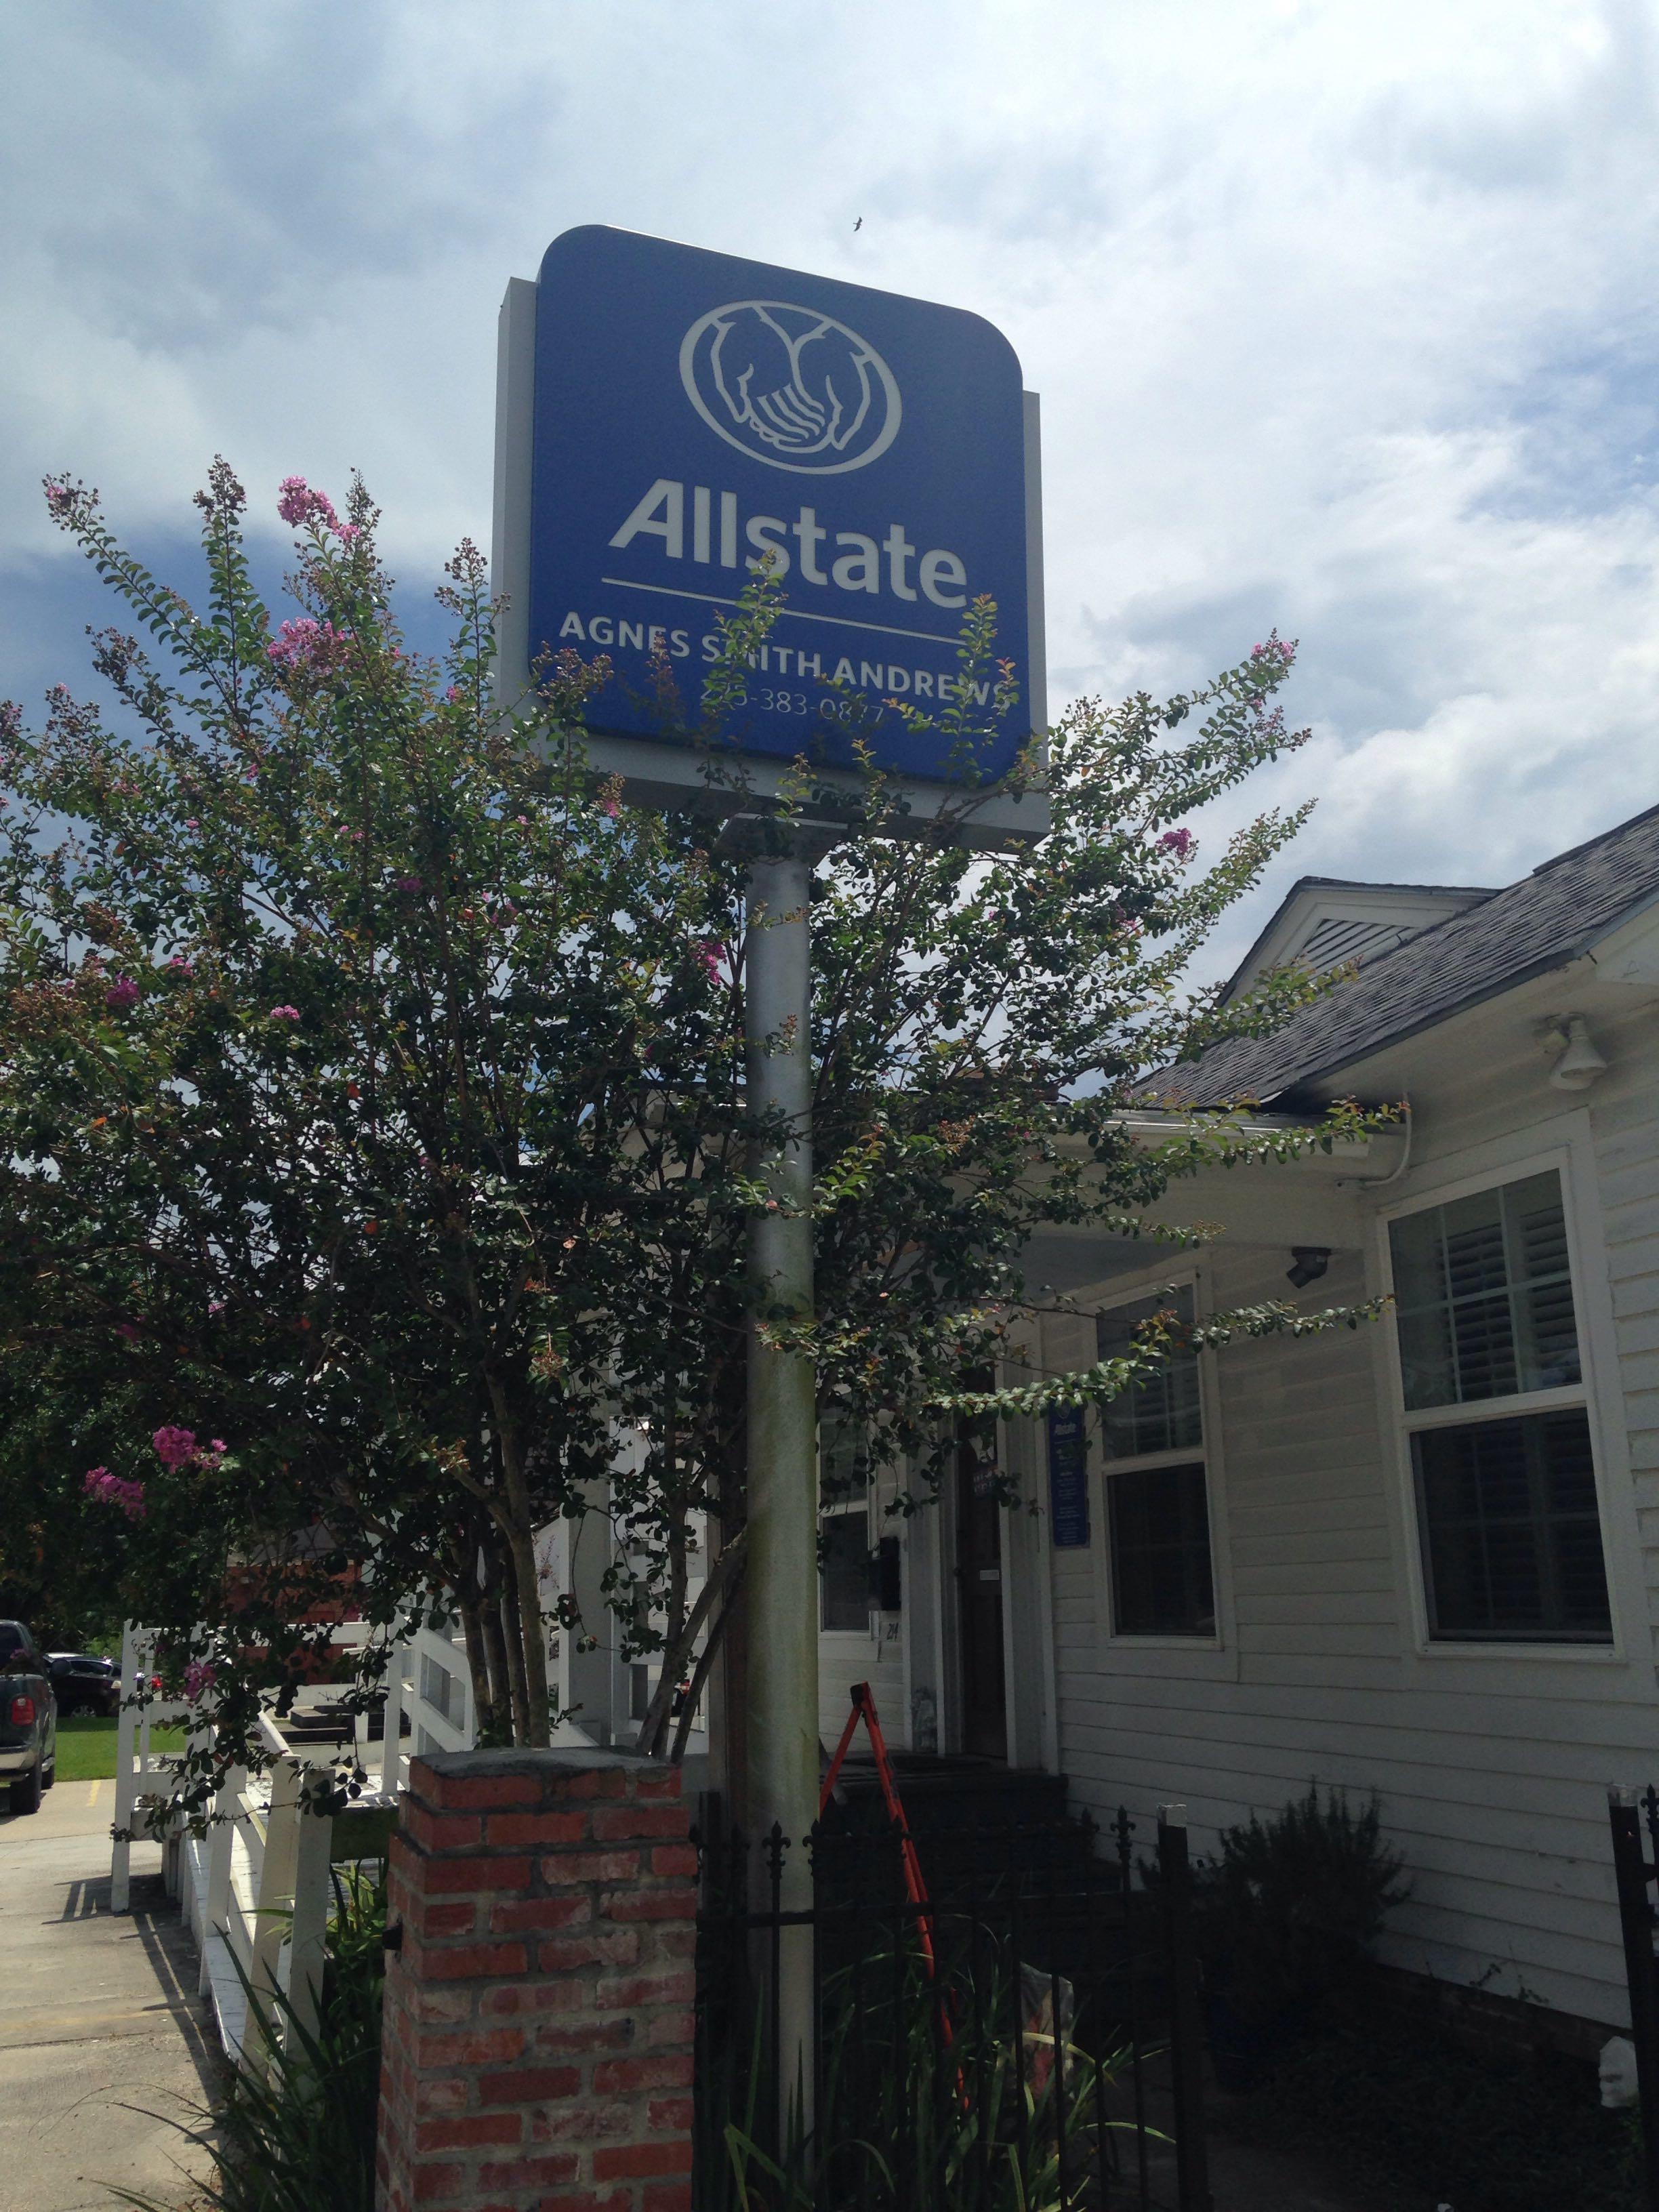 Agnes Andrews: Allstate Insurance image 1